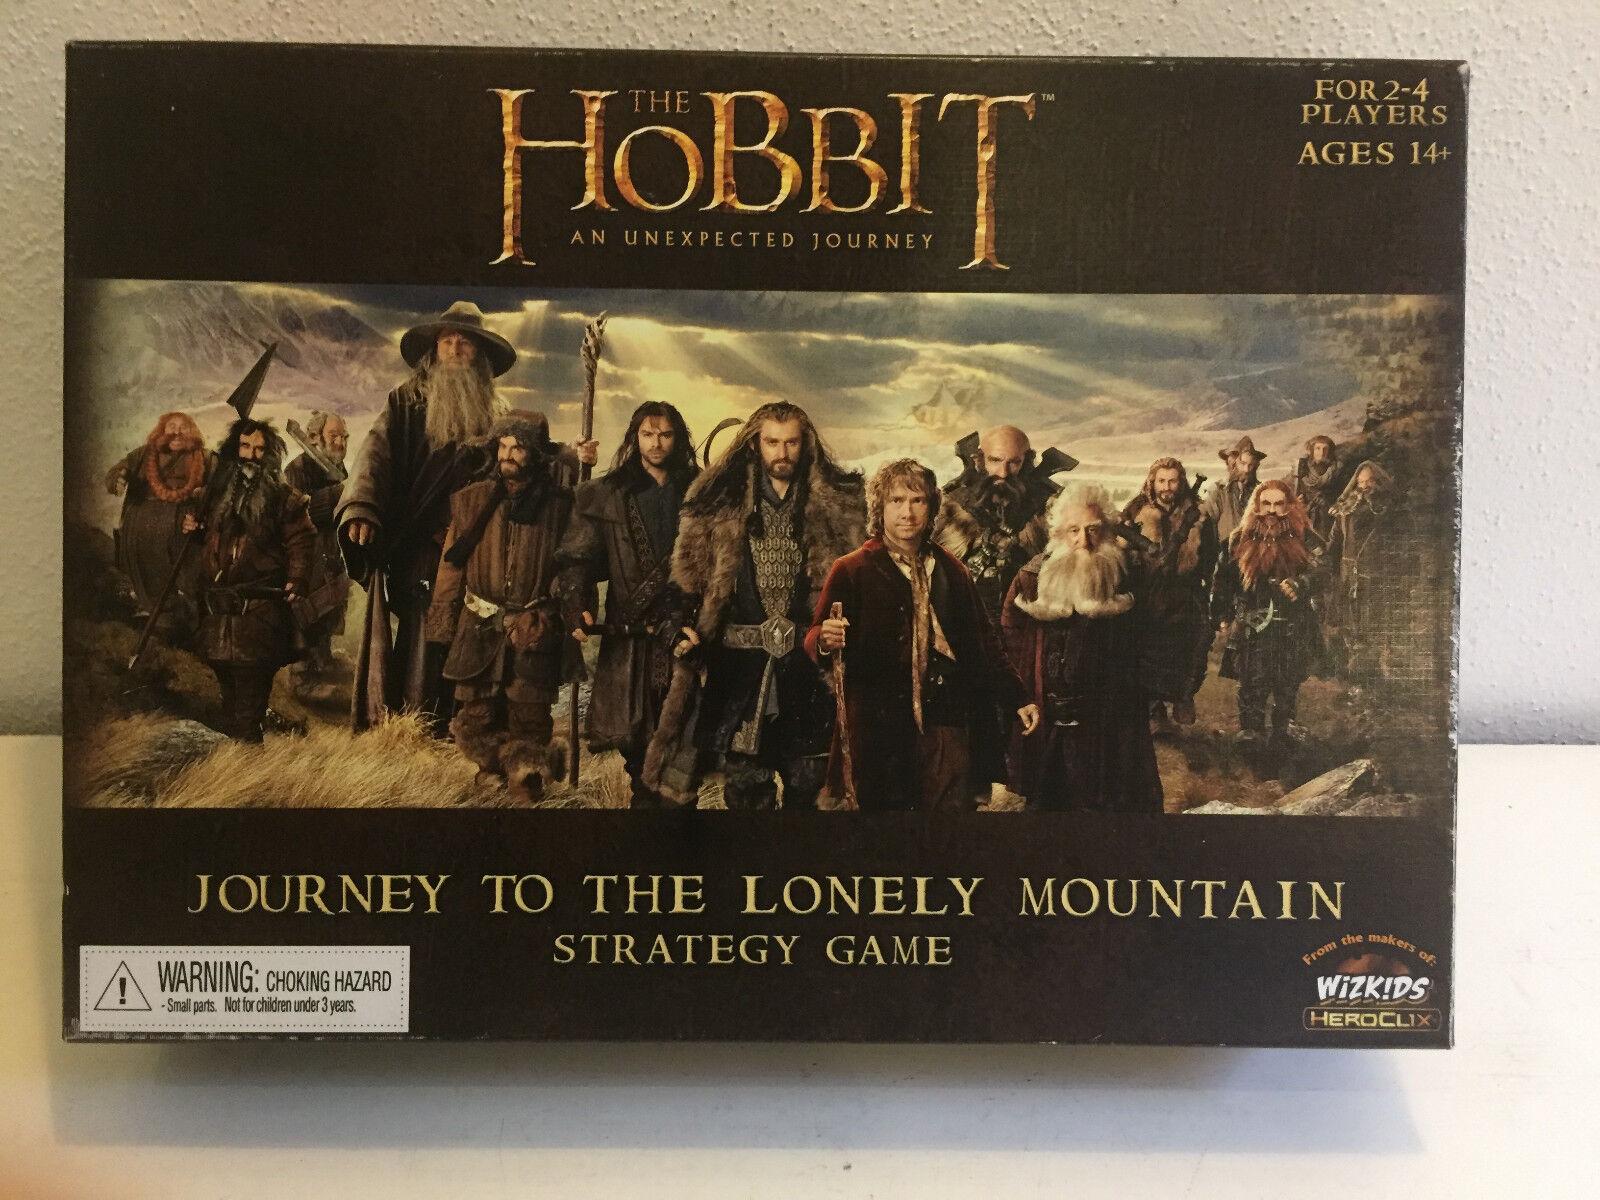 The Hobbit An unexpected Journey Wizkids Strategy Game Strategiespiel neuwertig